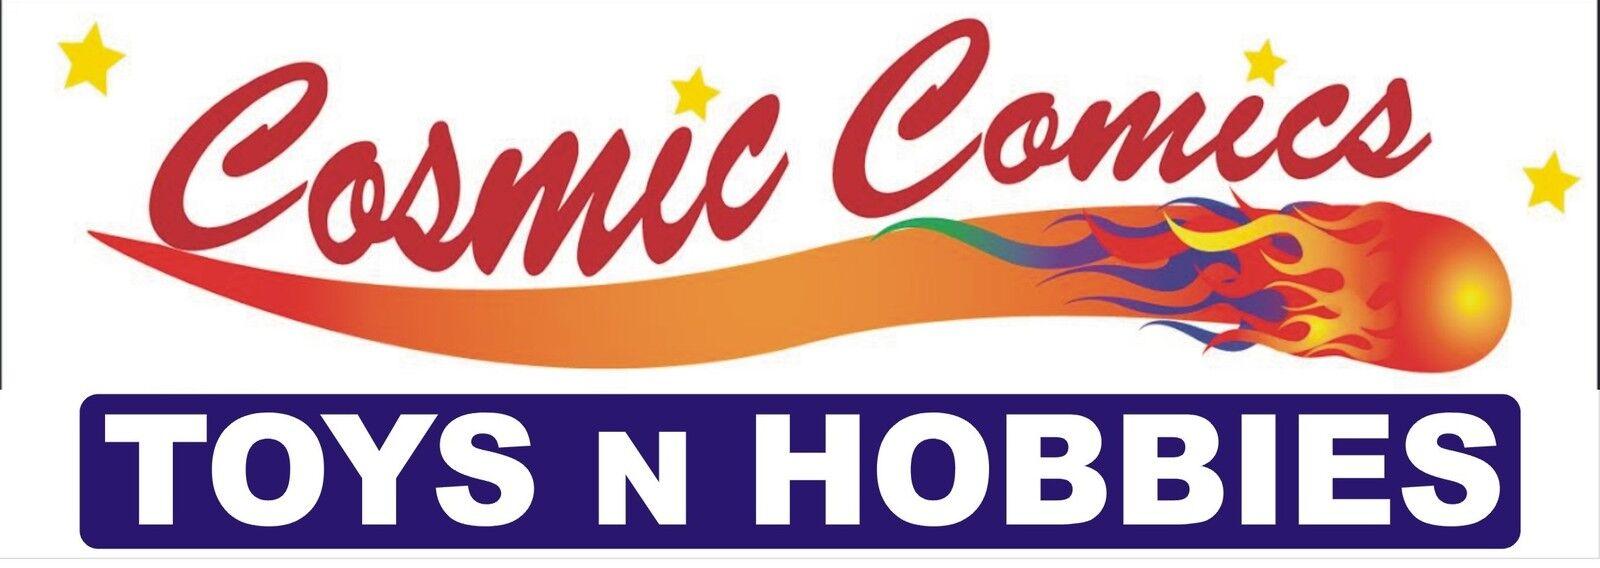 CC TOYS N HOBBIES